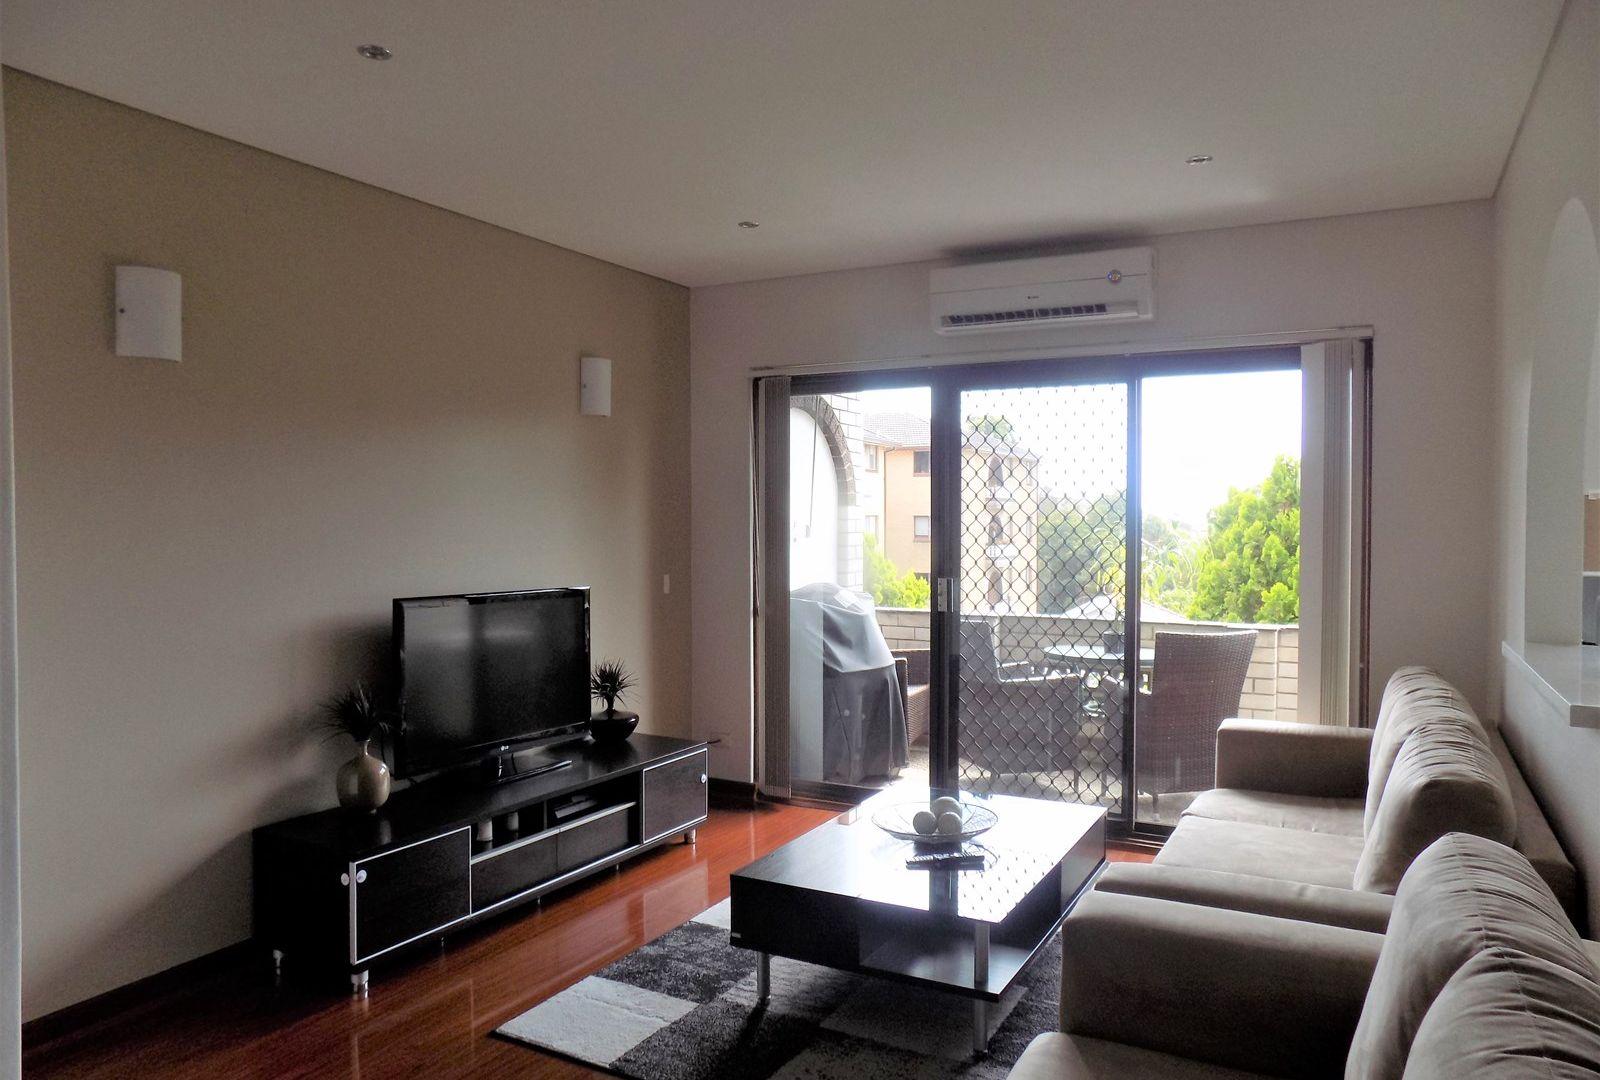 9-11 Hamilton Street, Allawah NSW 2218, Image 1